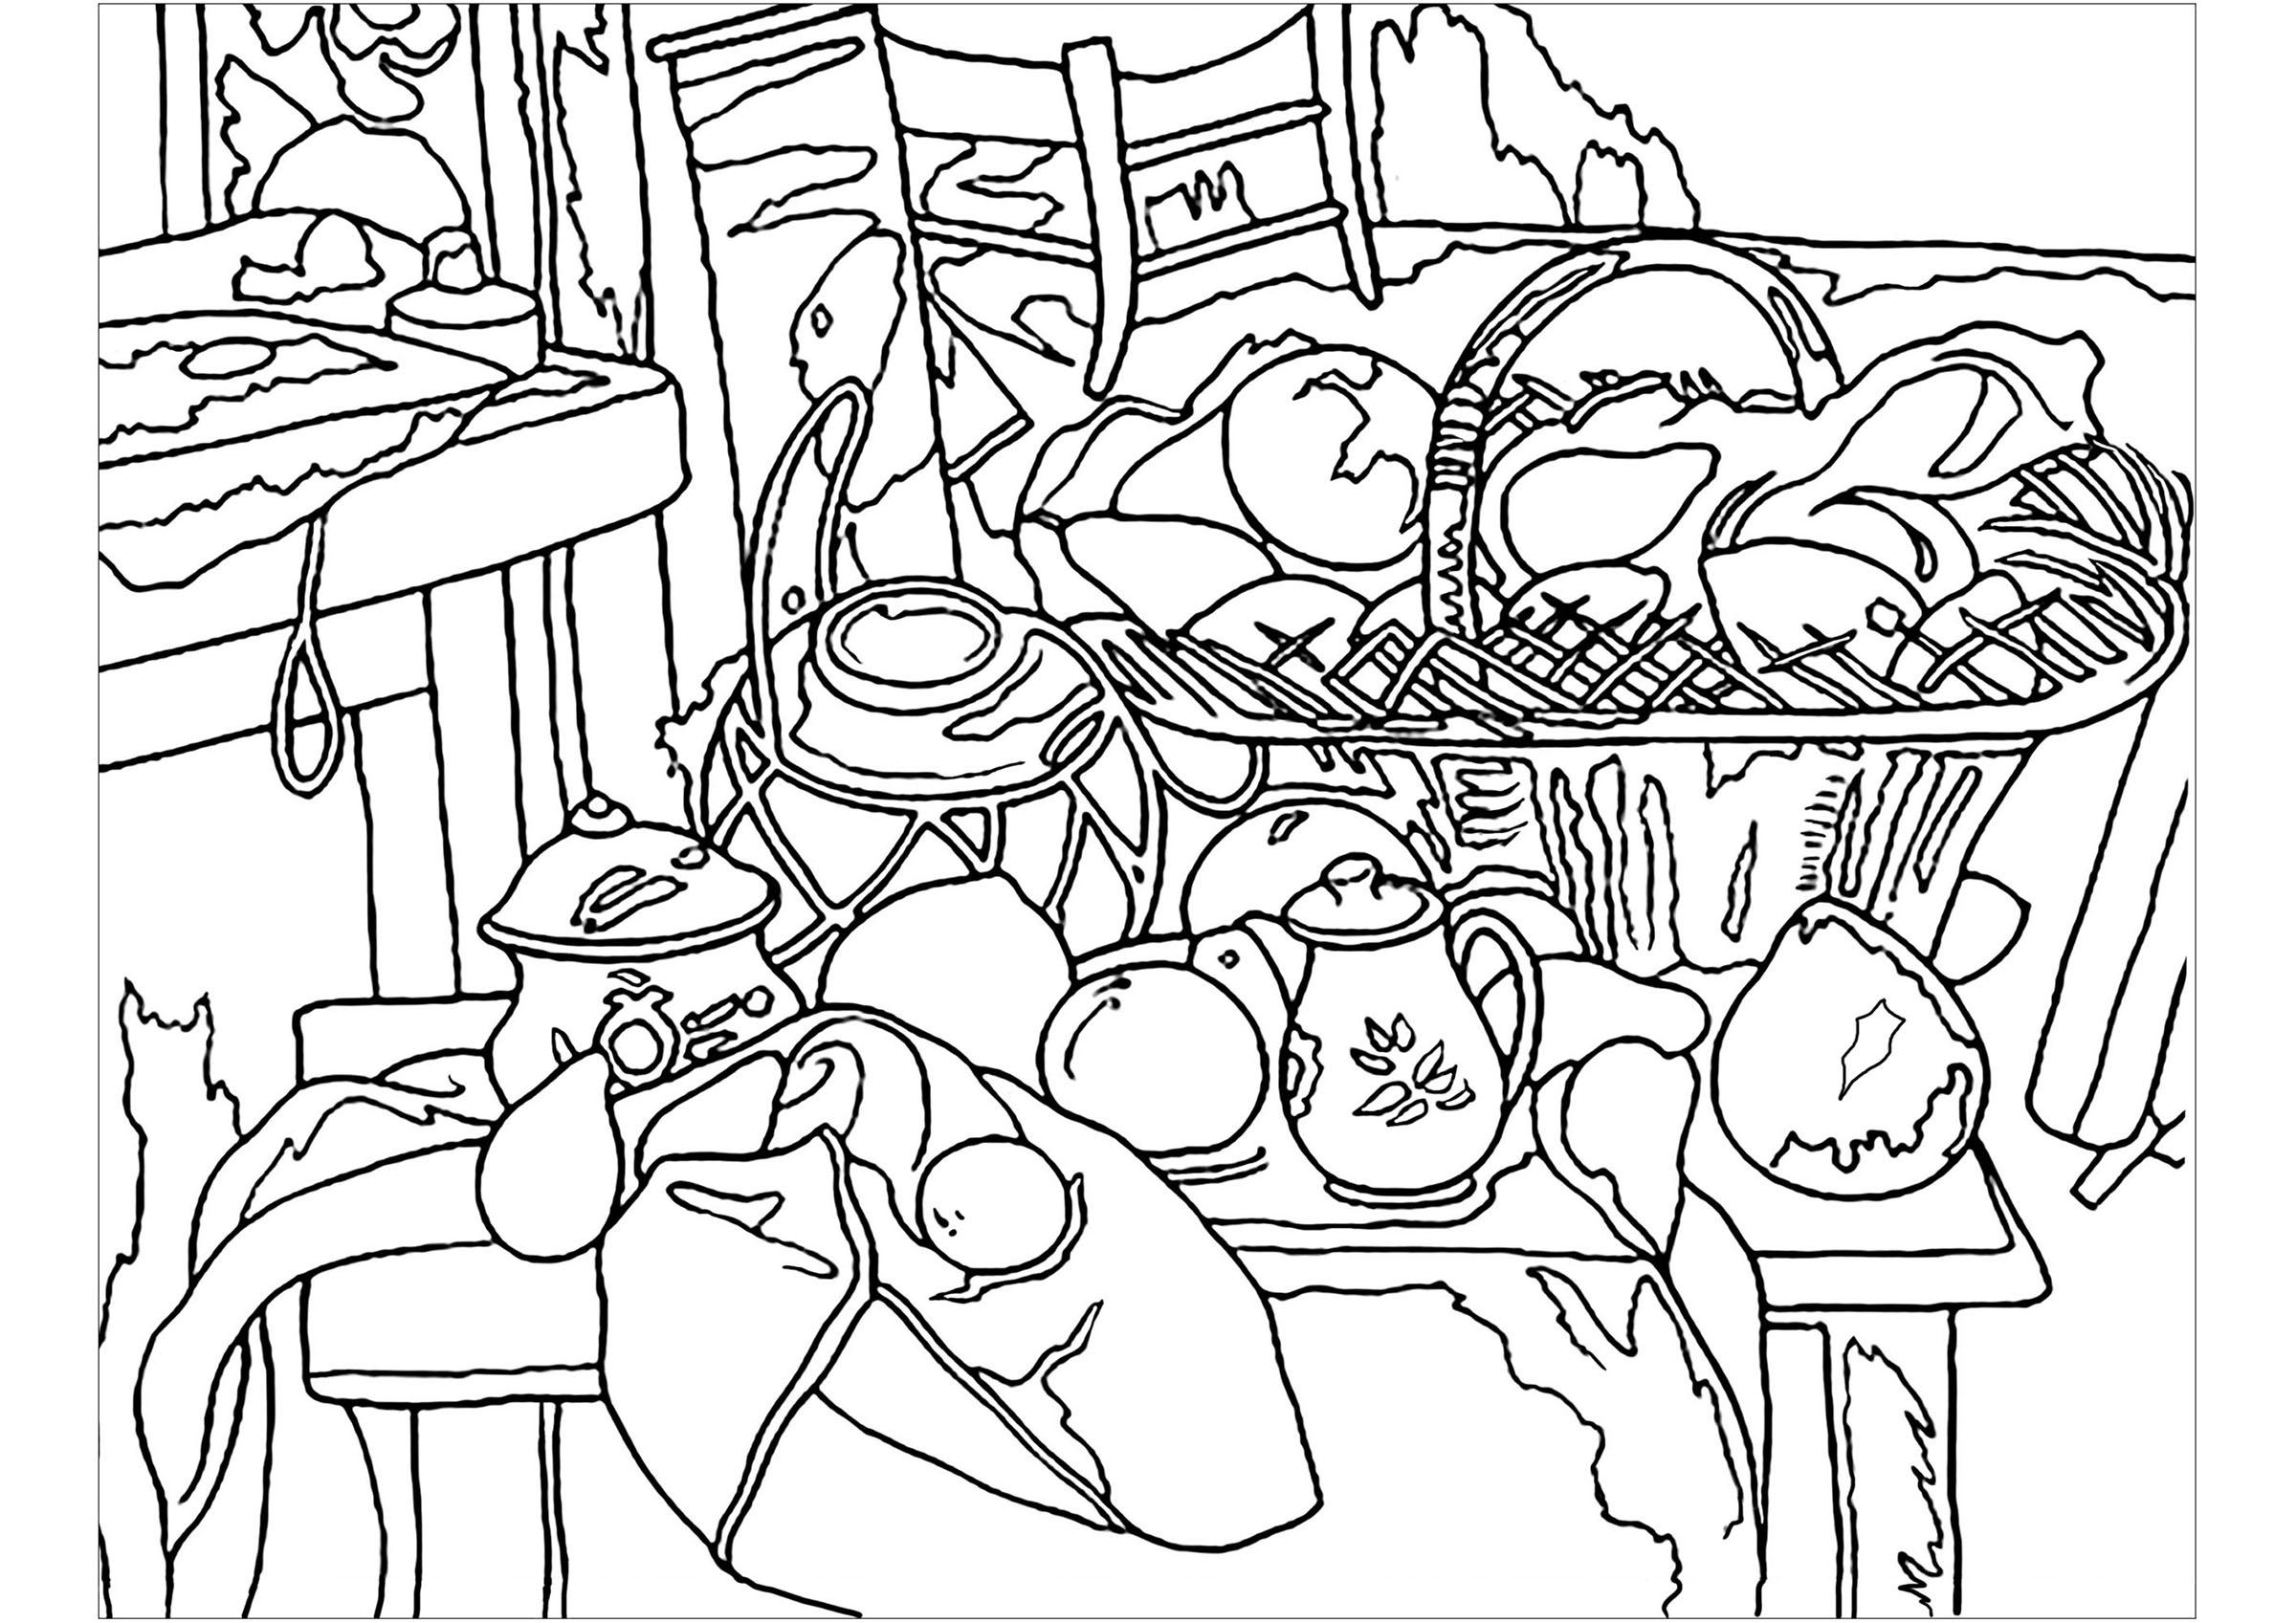 Simple Paul Cezanne coloring page